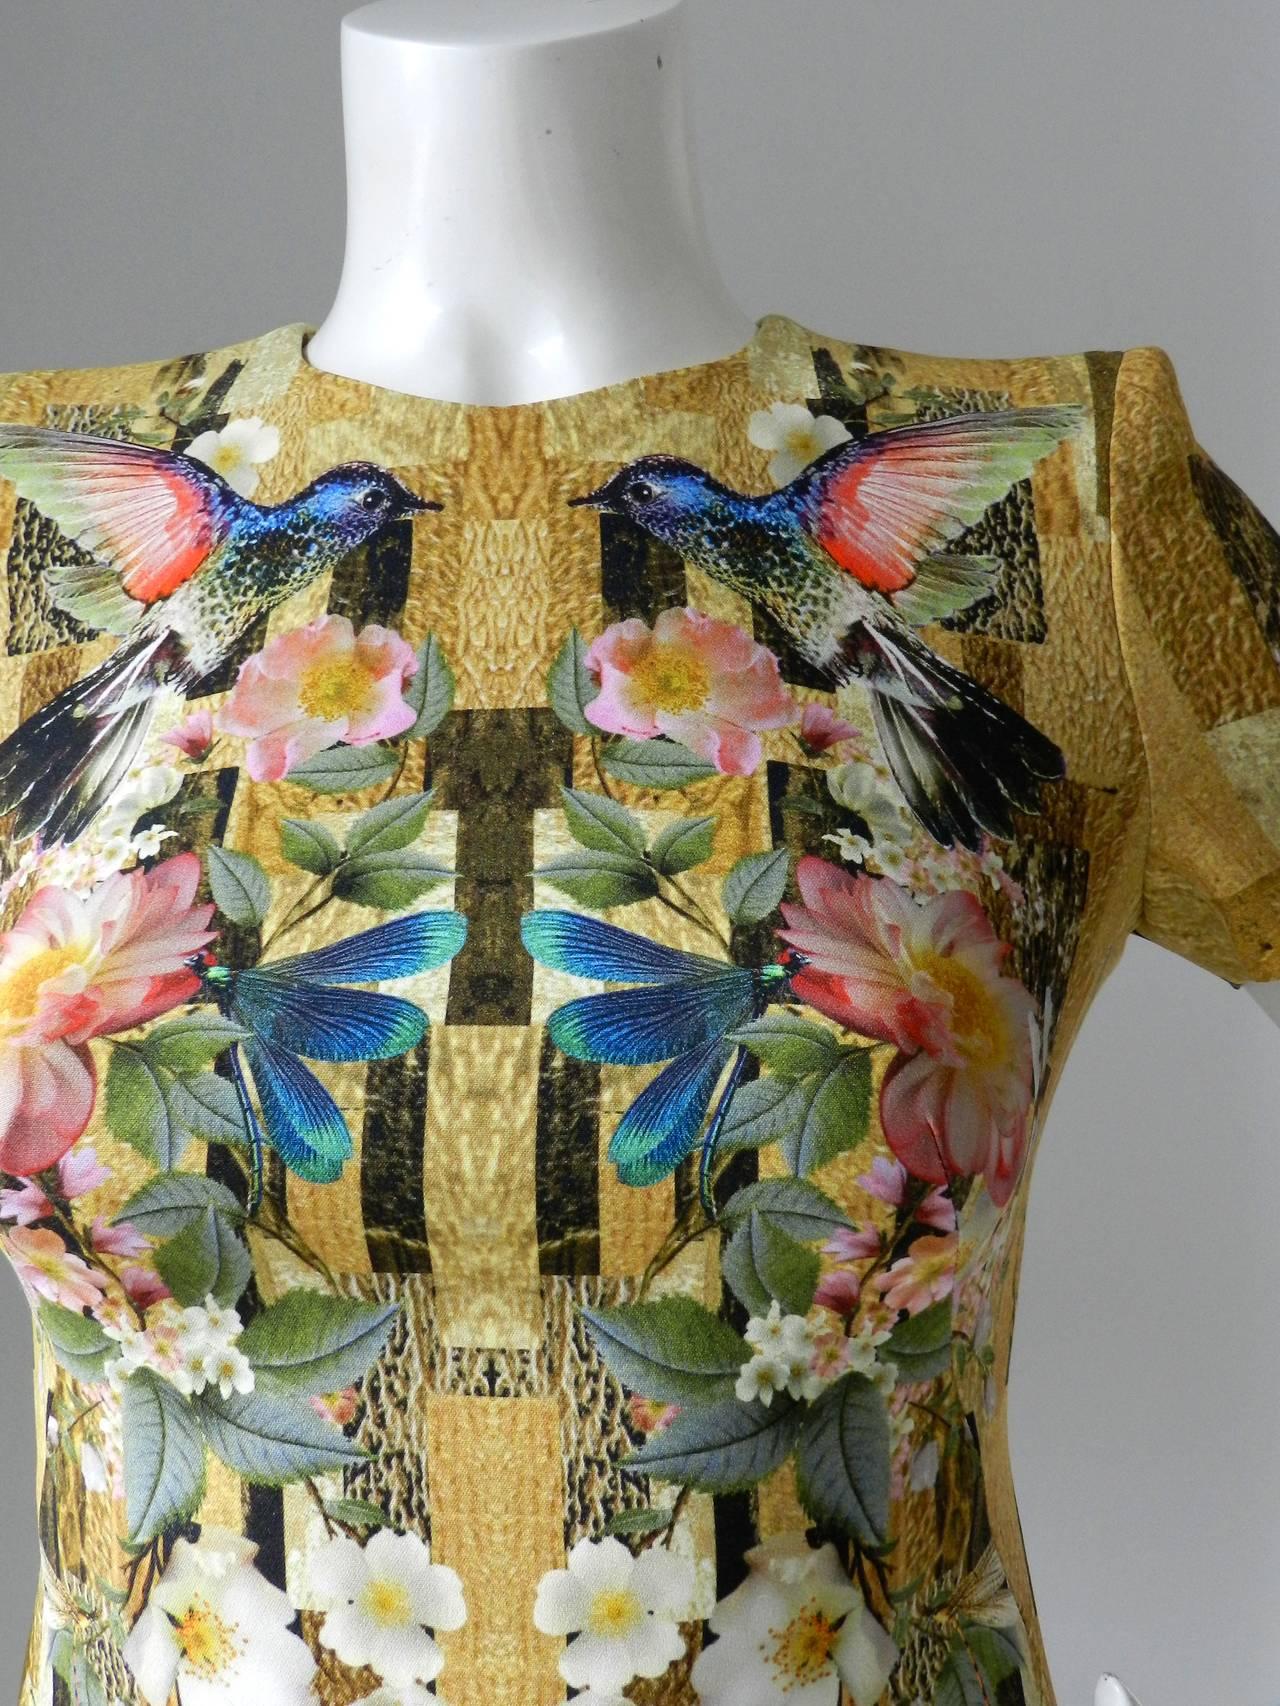 Alexander Mcqueen Hummingbird Digital Print Dress At 1stdibs